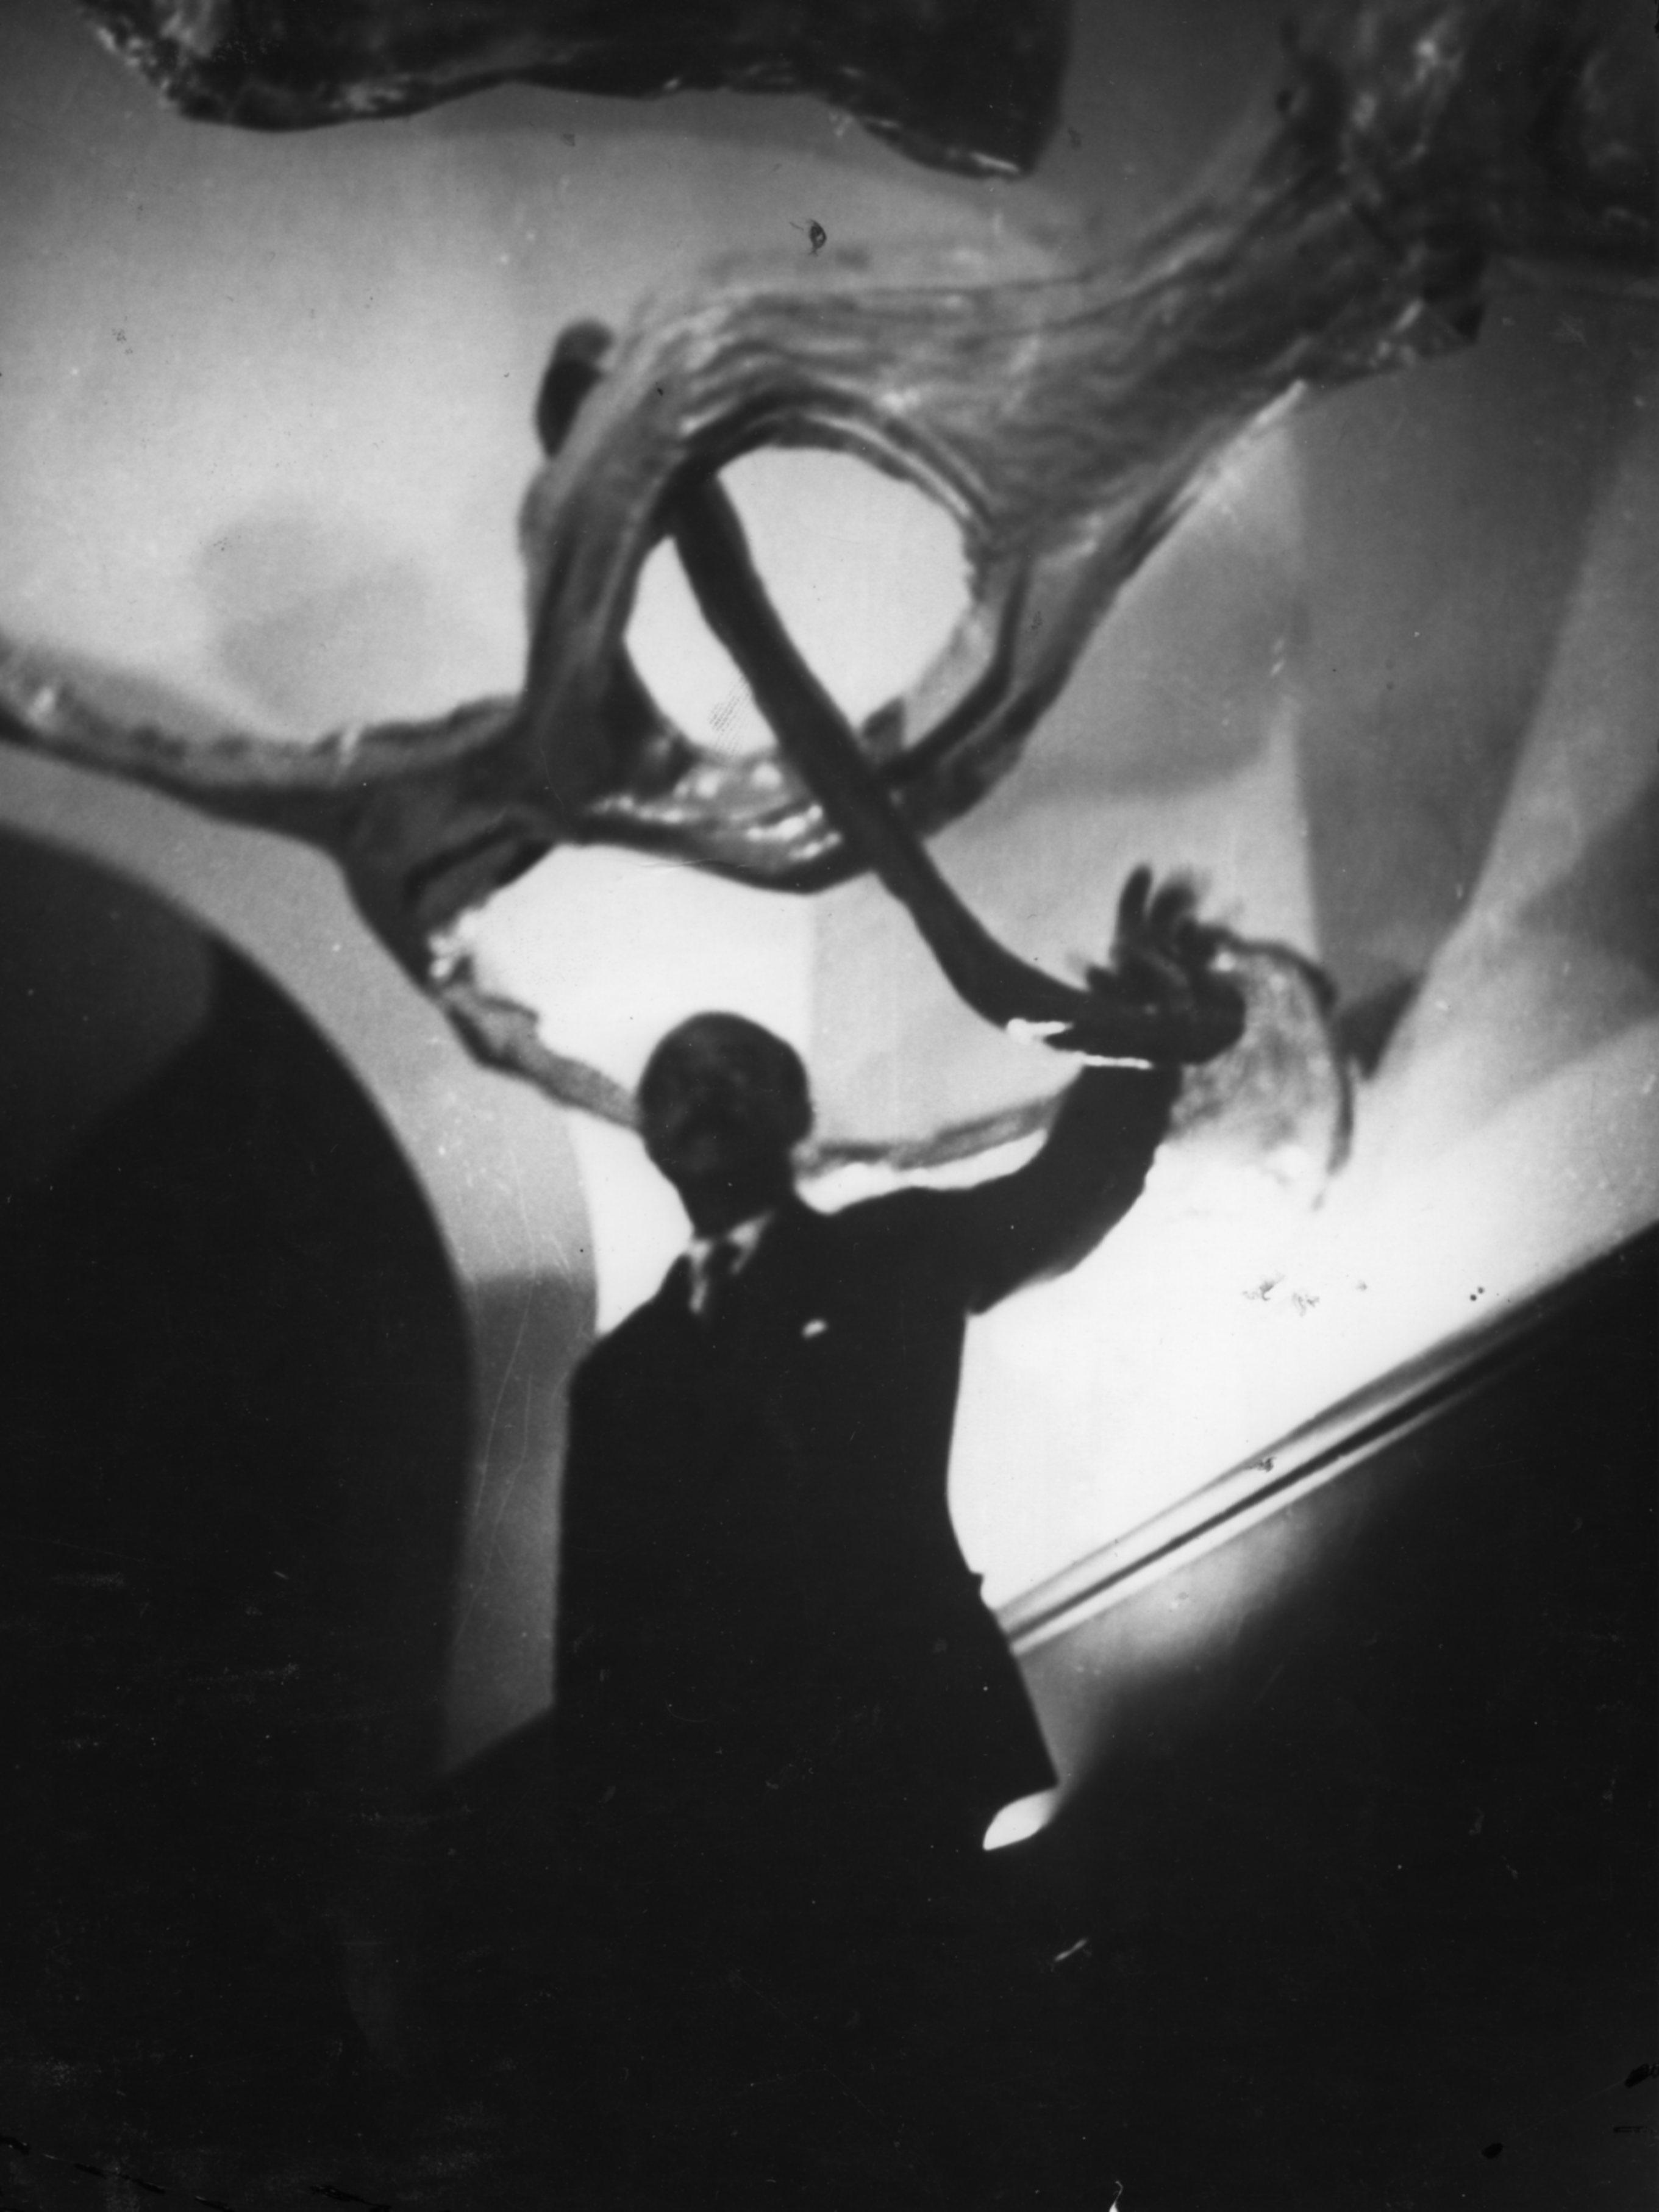 Lucio Fontana Ambiente spaziale a luce nera, 1948-1949